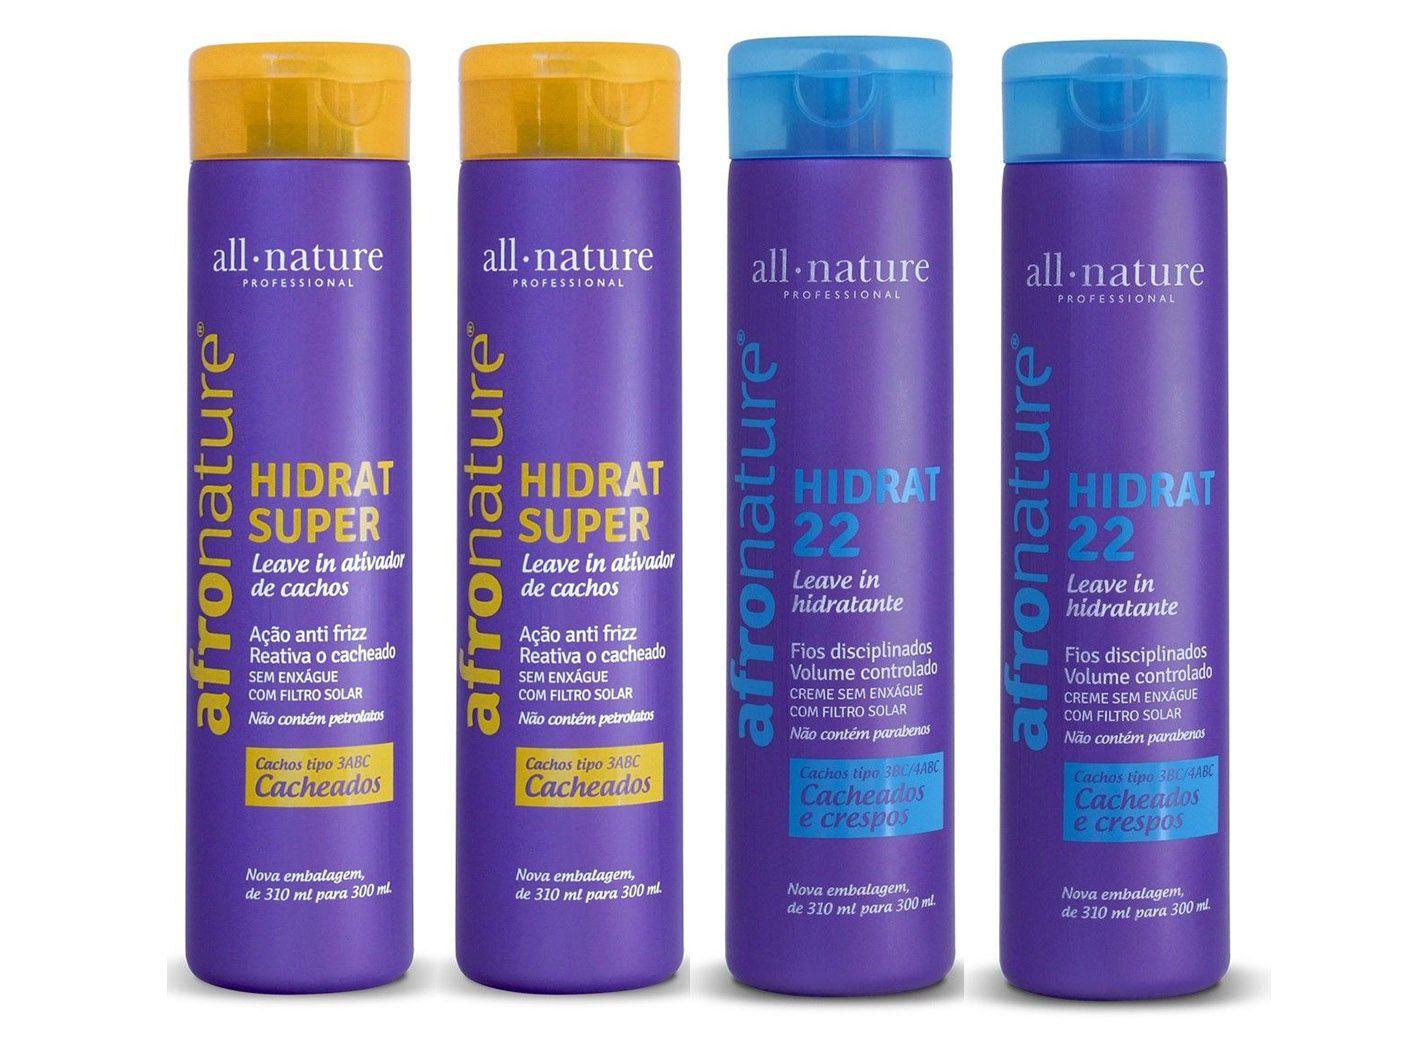 Kit Afro Nature Hidratante Super Ativador de Cachos e Hidrat 22 Creme Para  Pentear All Nature - 4 Unids. A Escolher